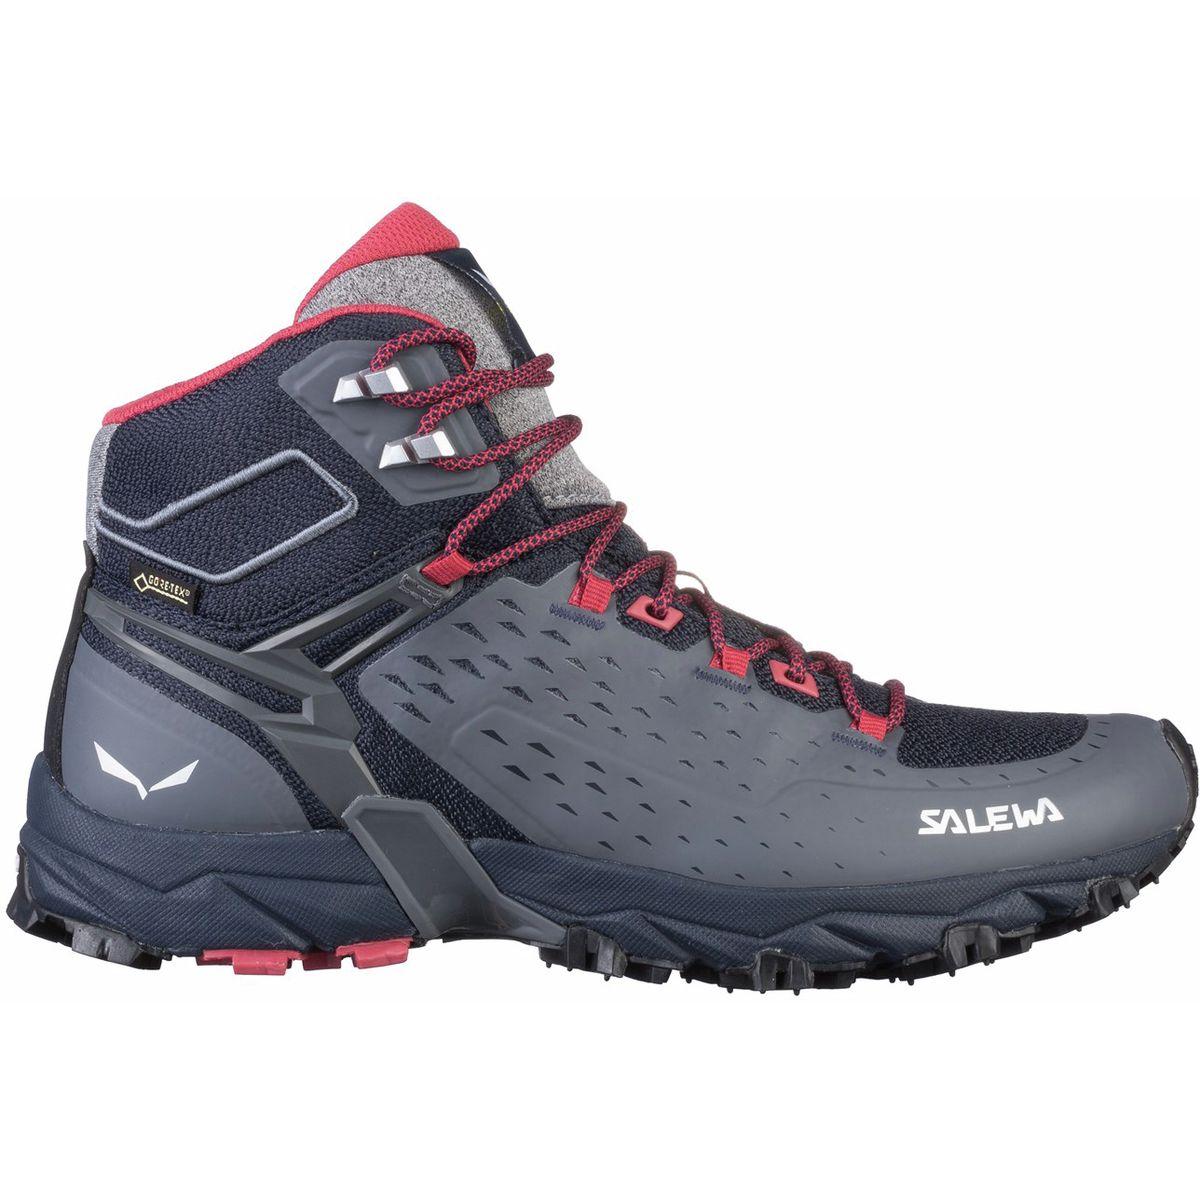 Salewa Alpenpink Ultra Mid GTX shoes - - - Women's 9b3ef1